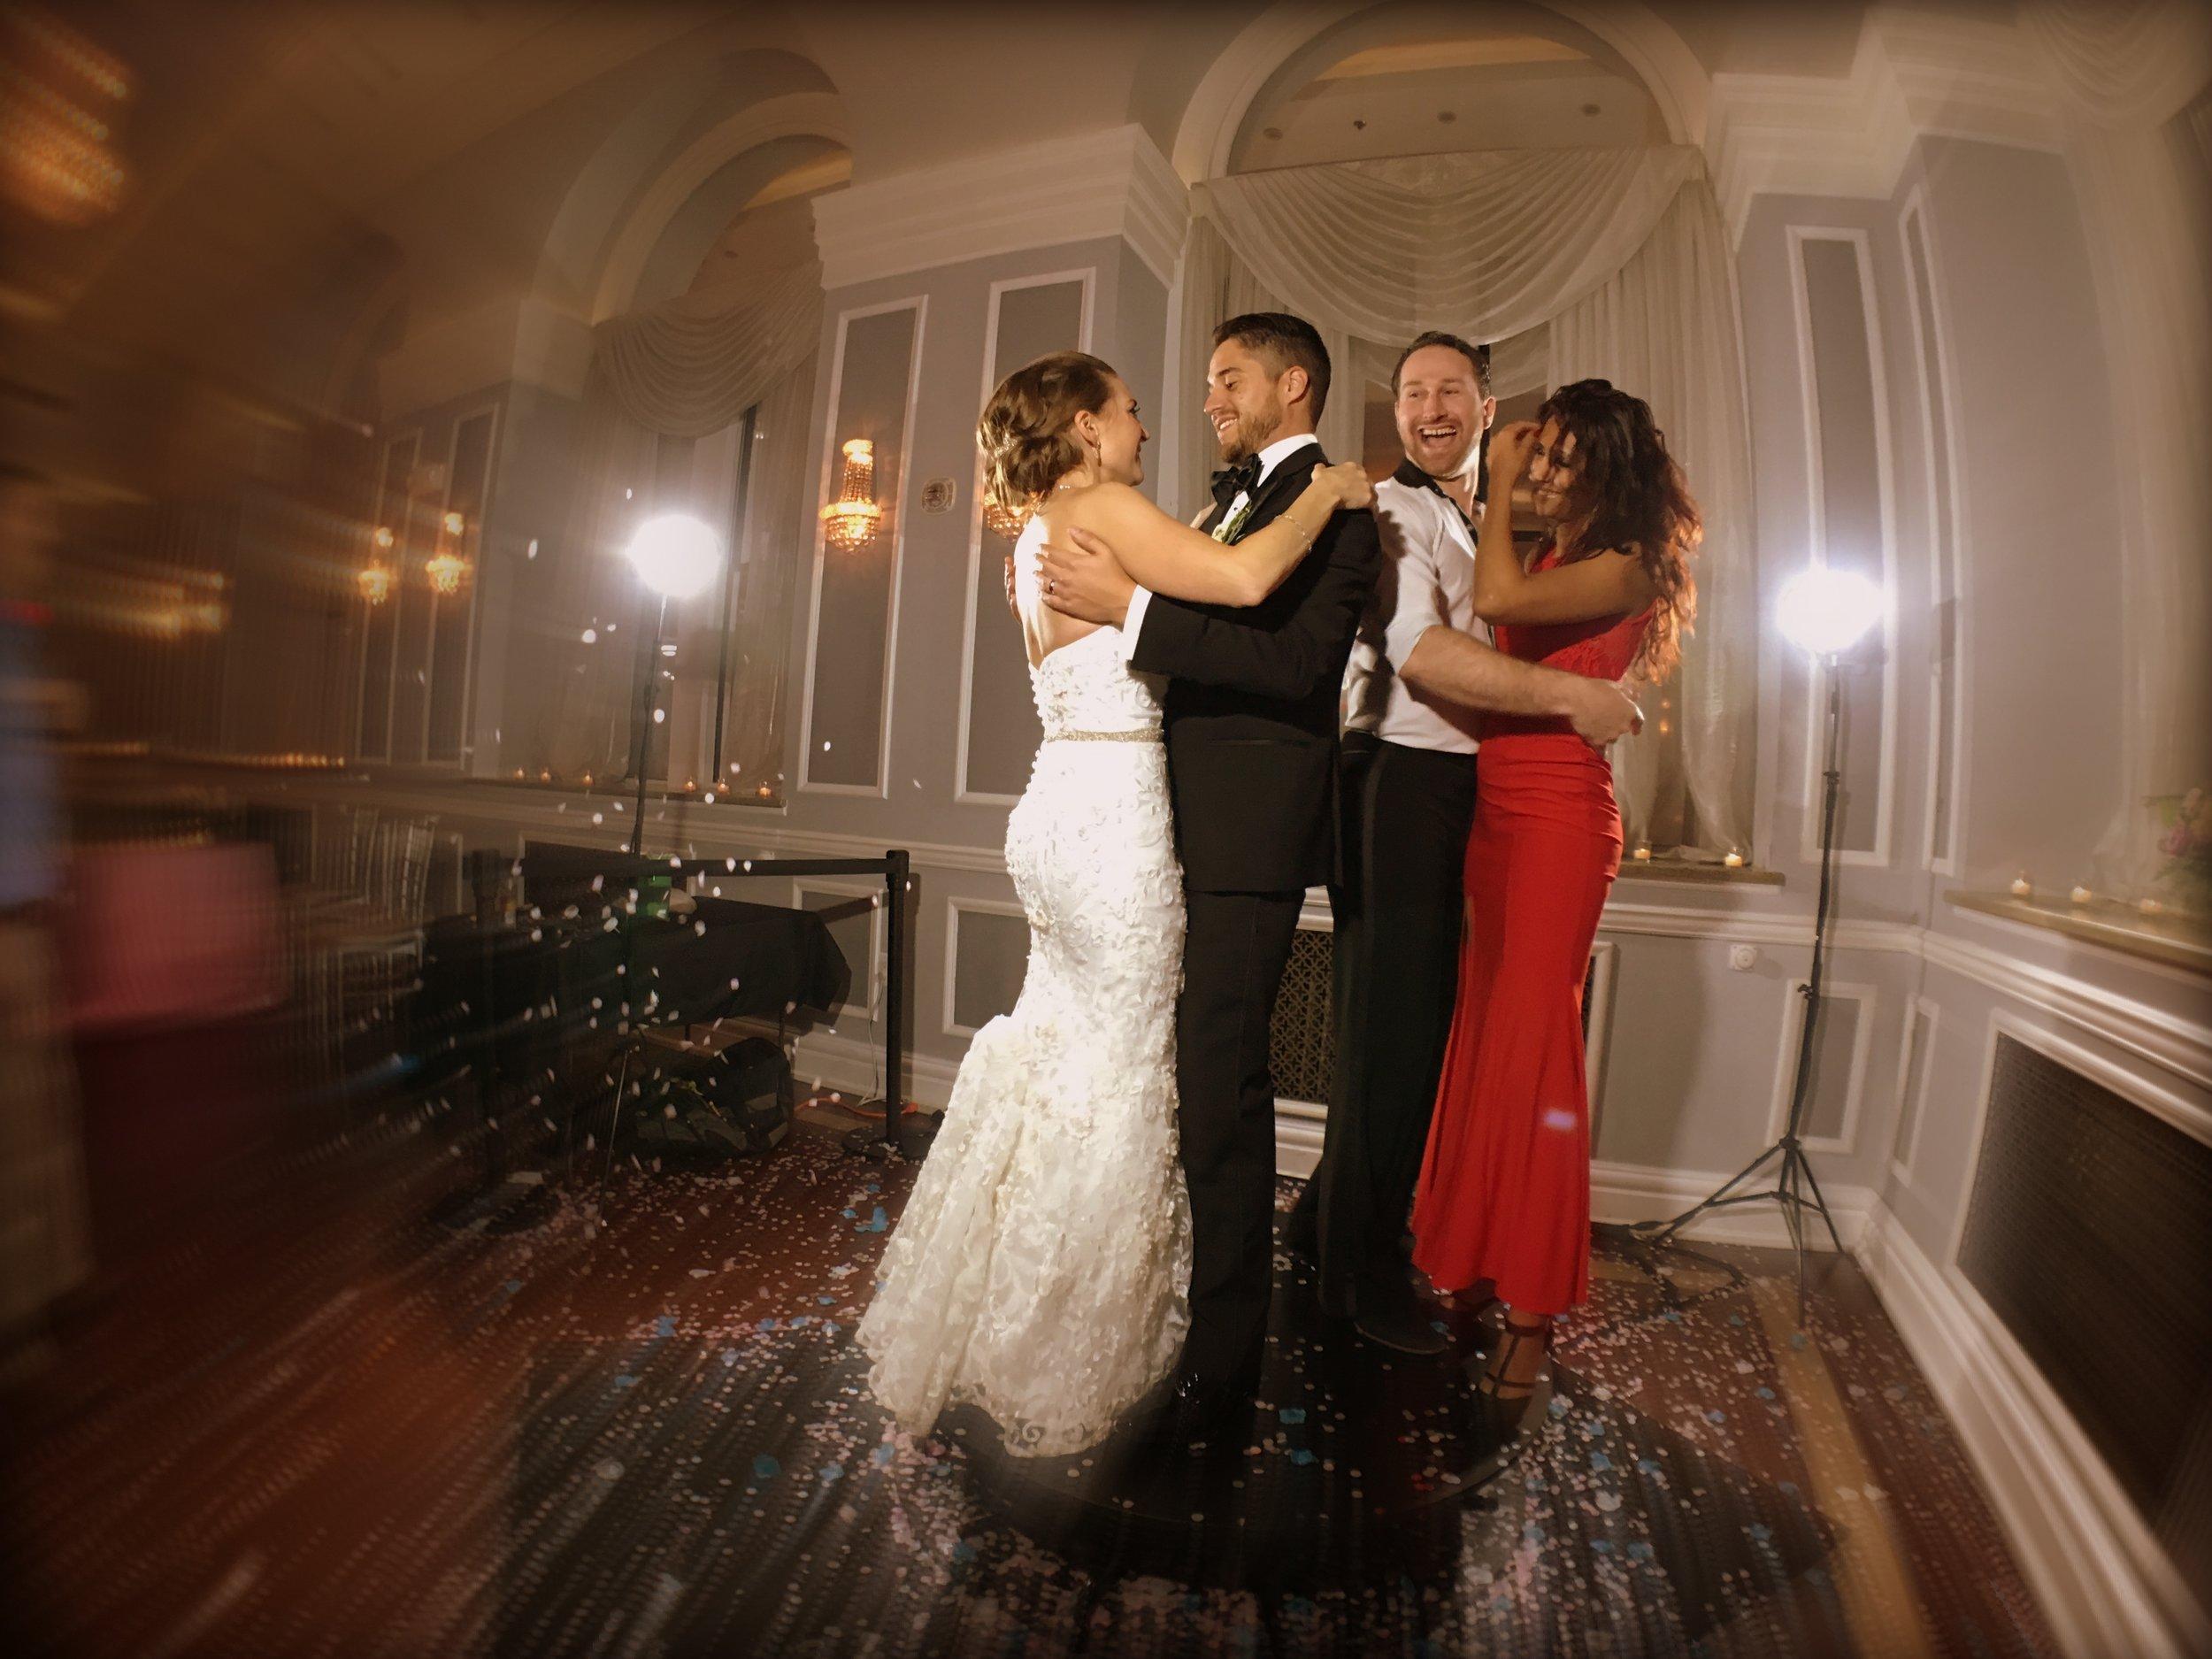 Wedding Booth-001.JPG